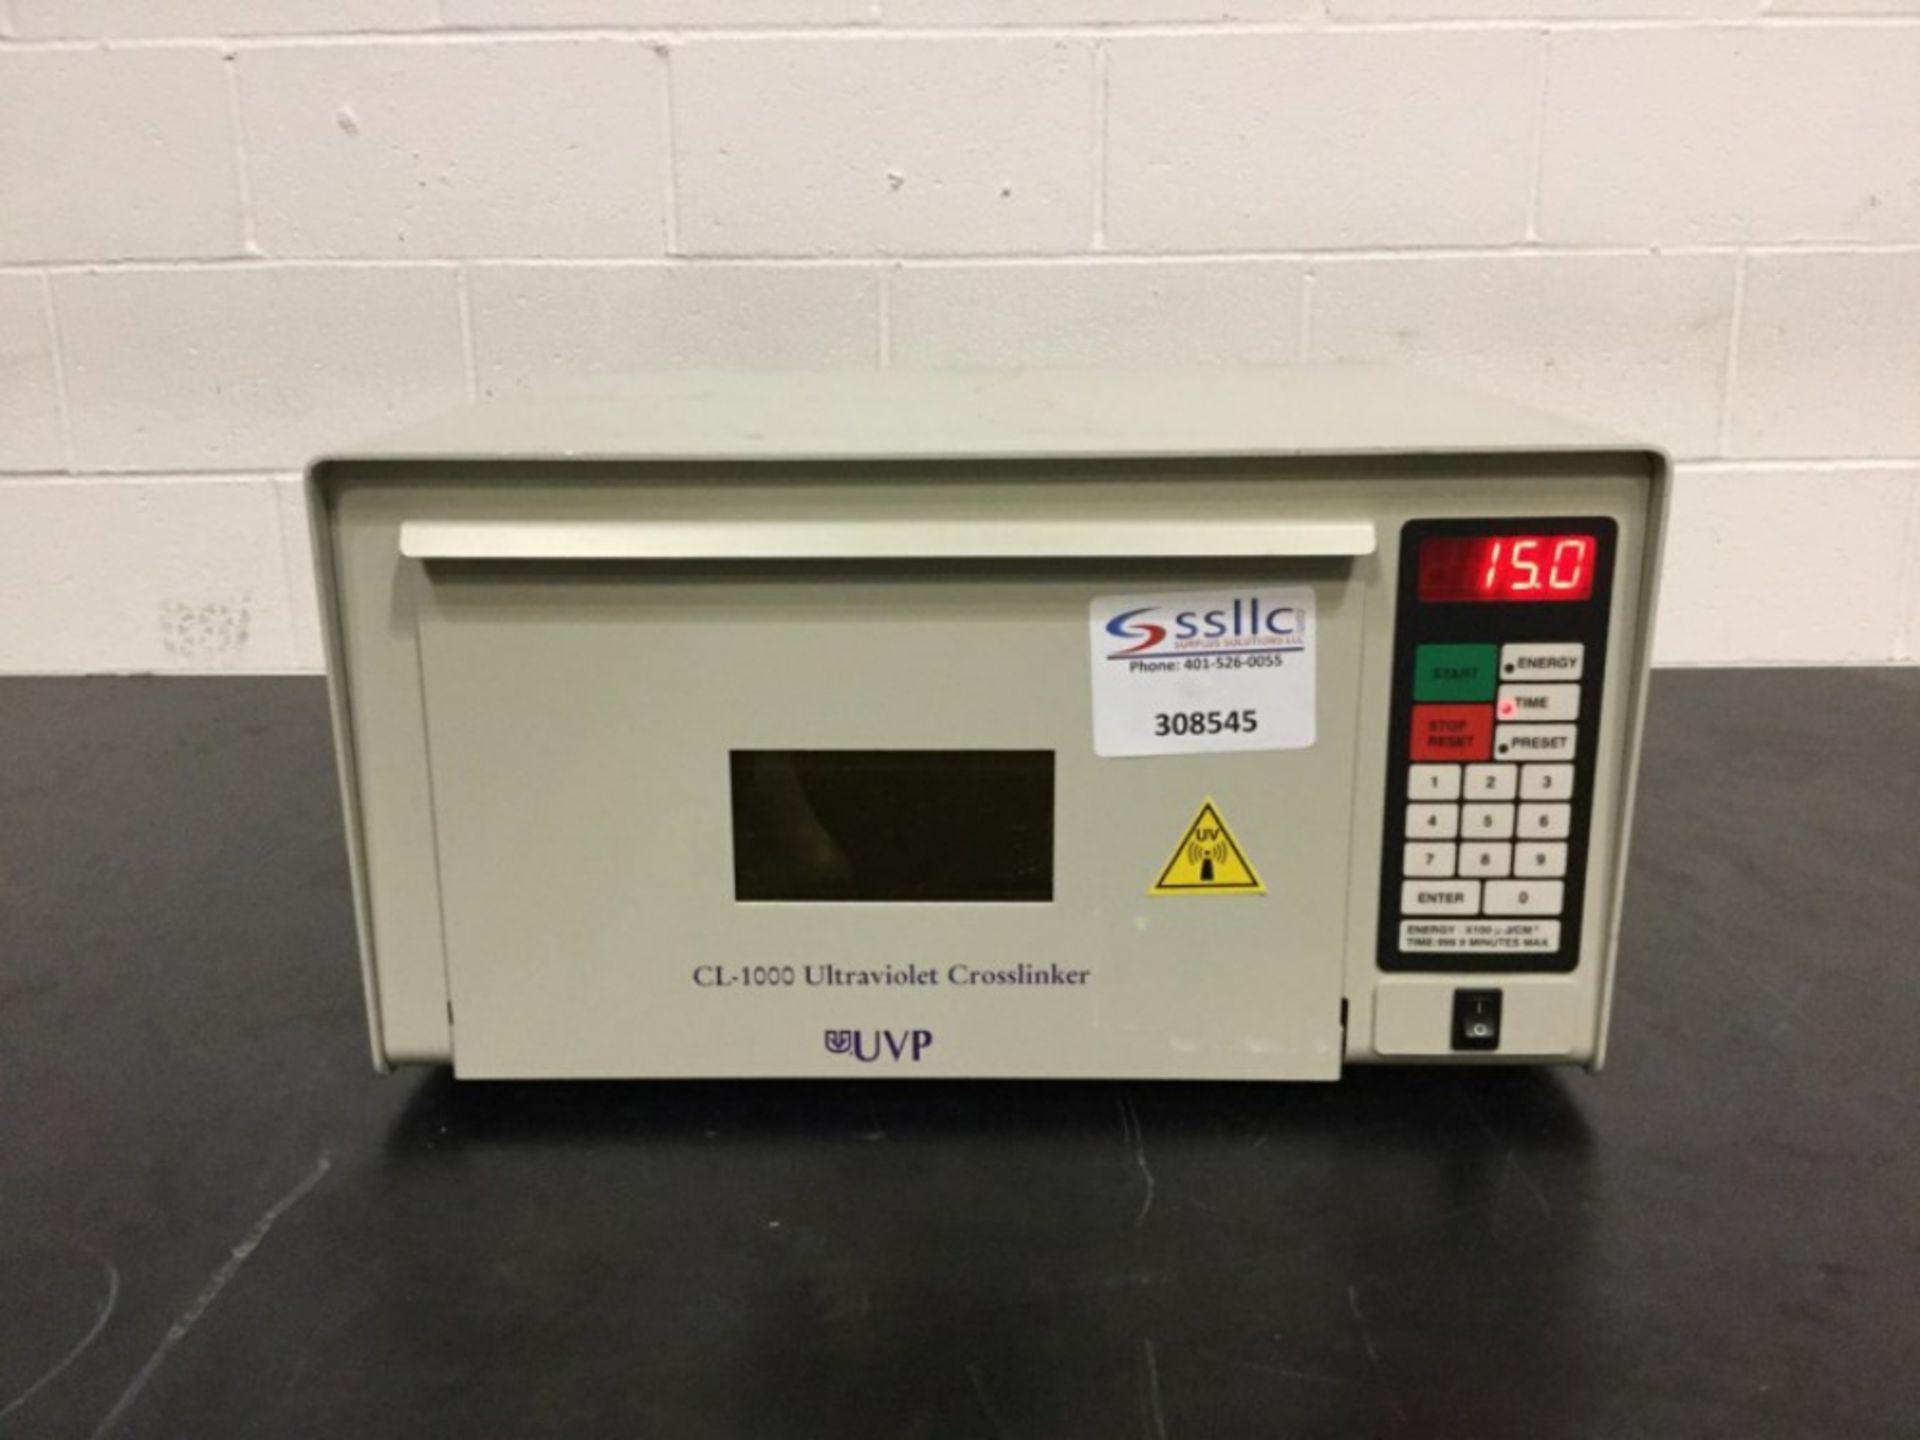 Lot 27 - UVP CL-1000 Ultraviolet Crosslinker